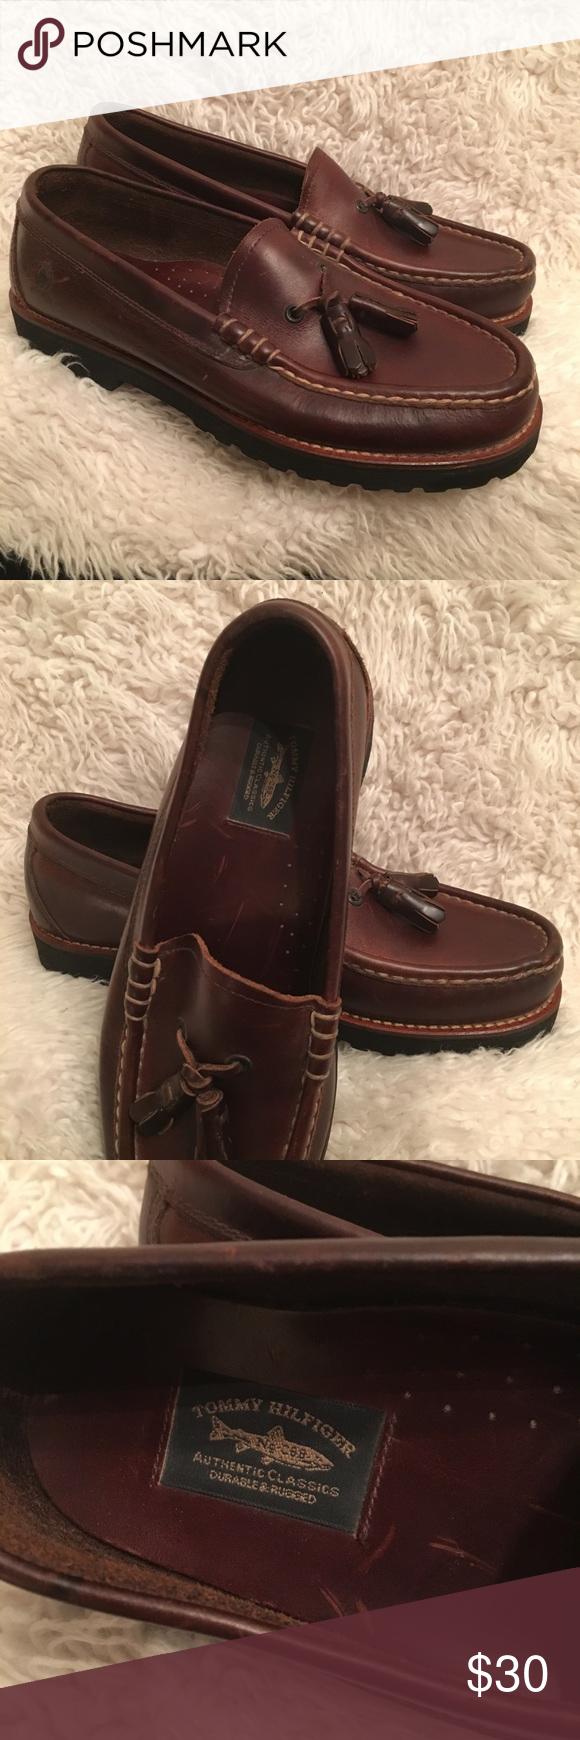 Vintage Vintage Tommy Hilfiger Rugged Low Top Boot | Grailed